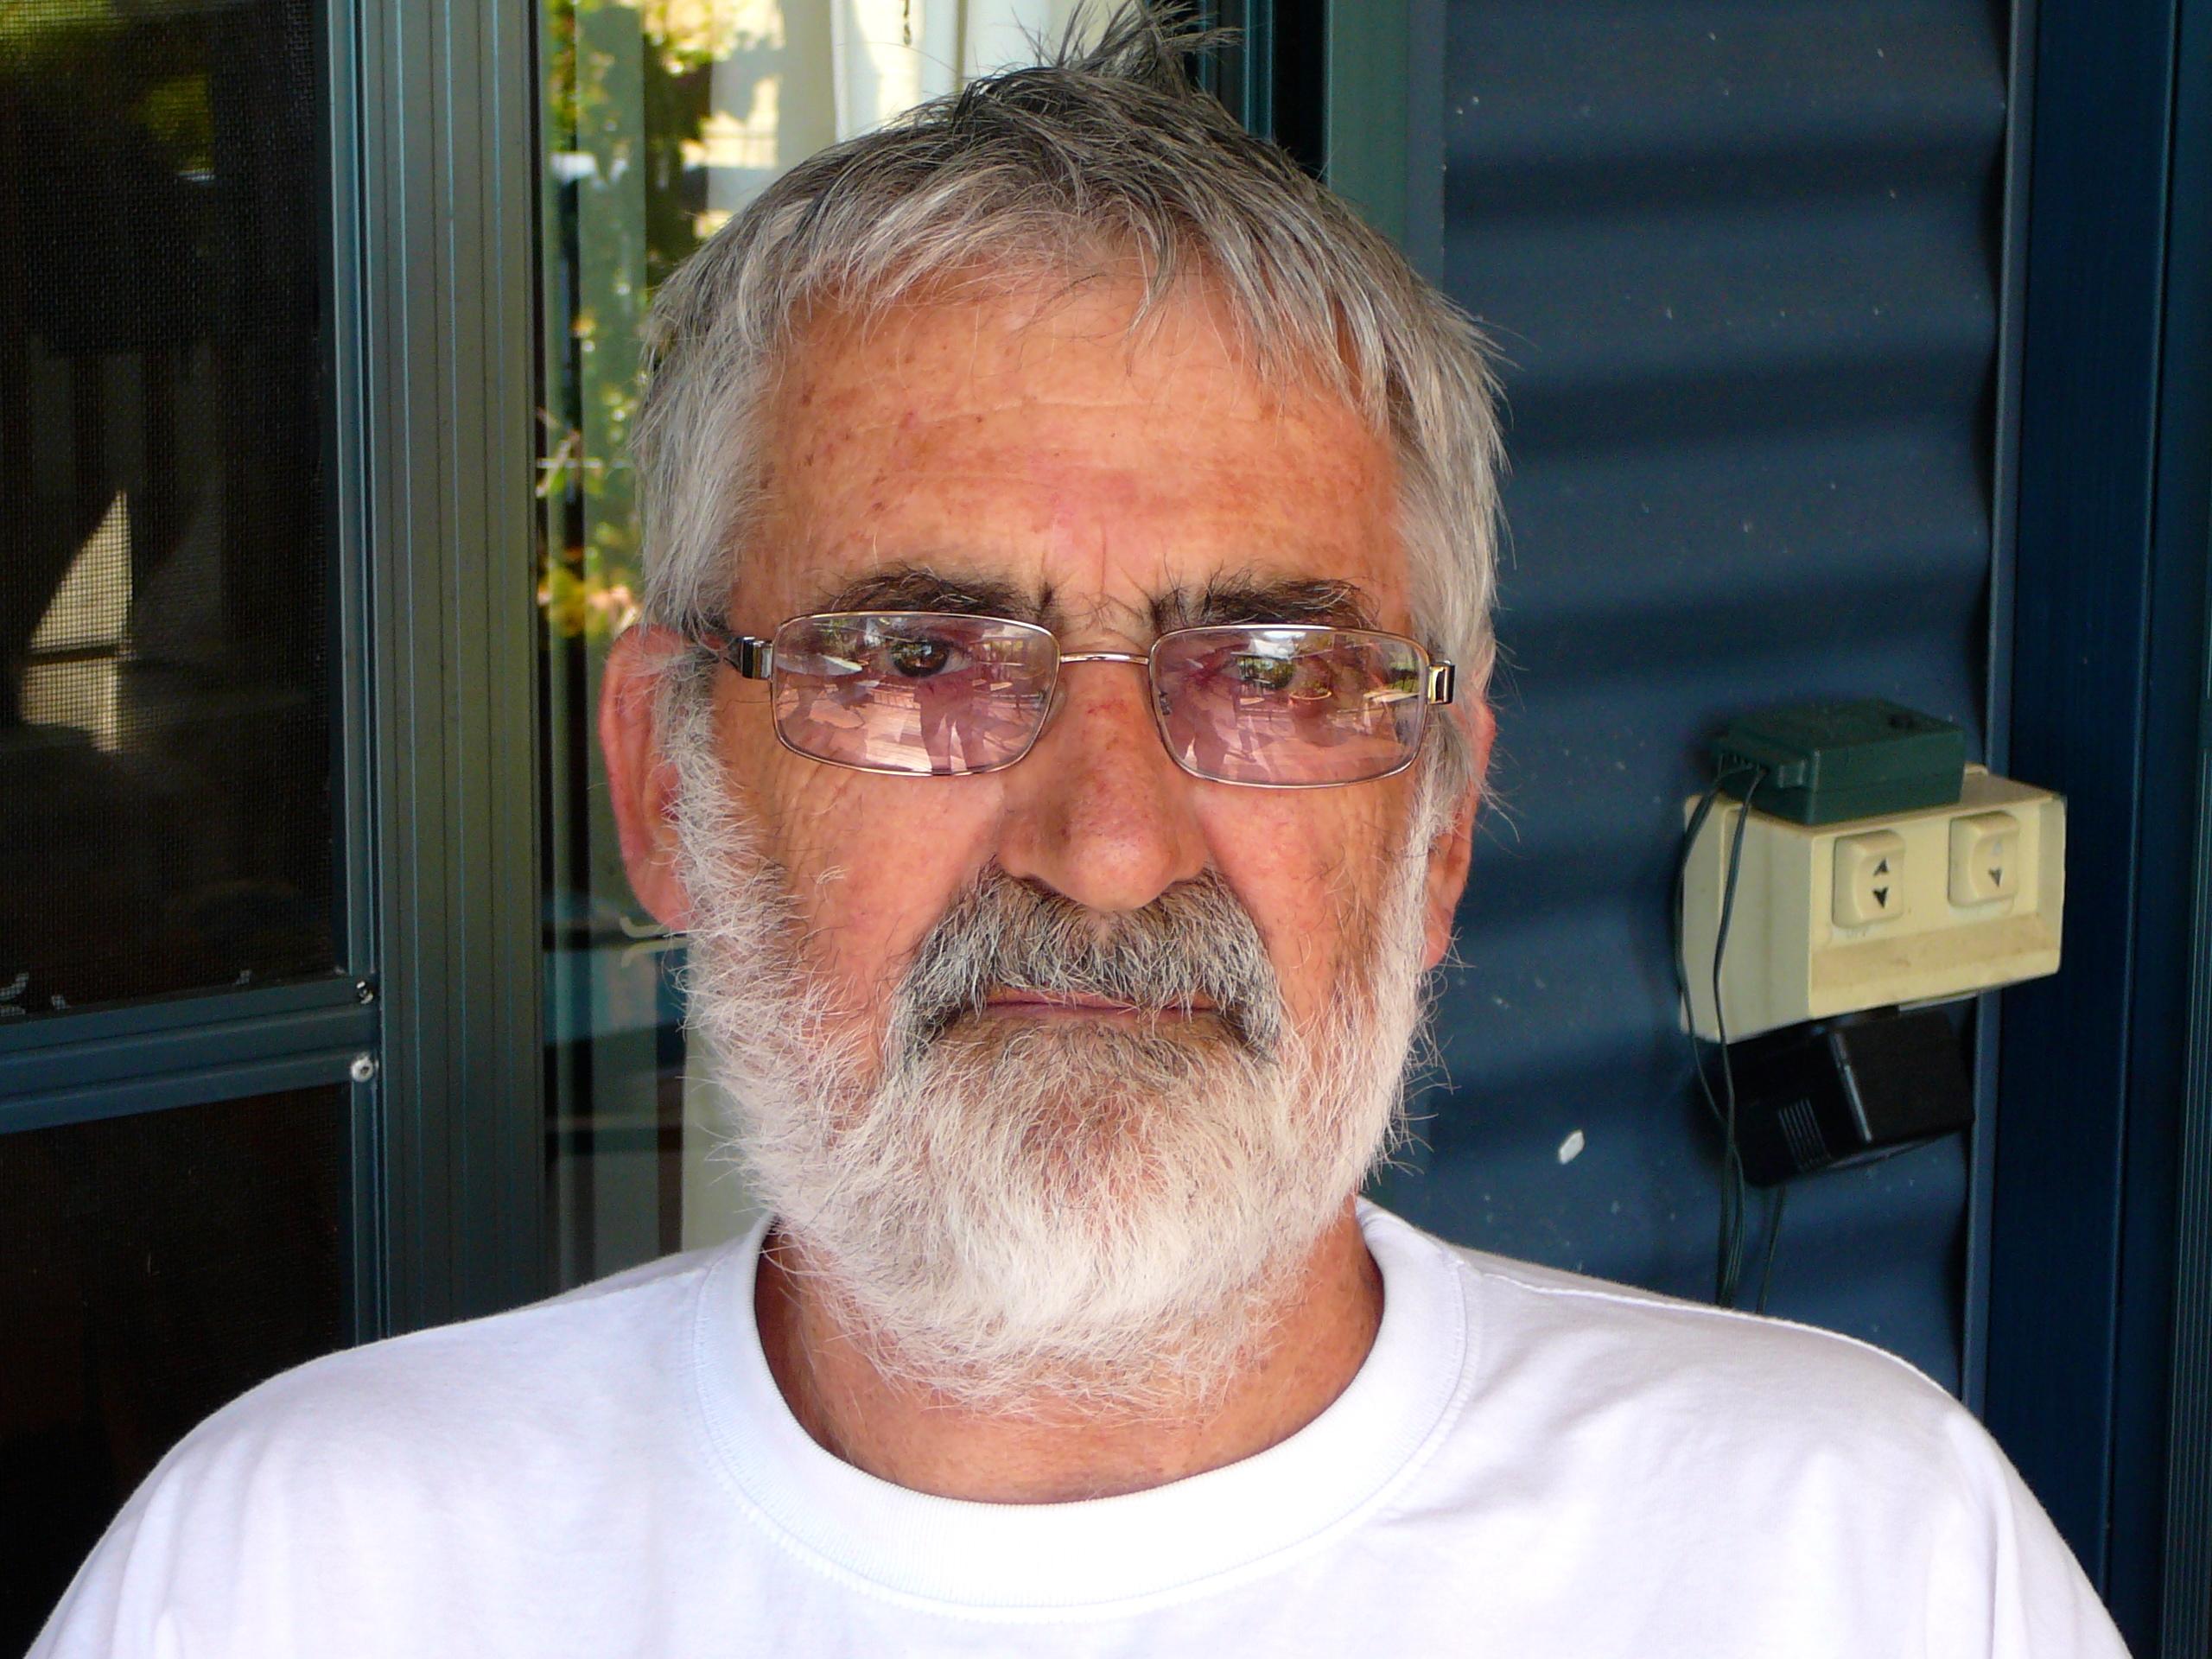 Emeritus Professor Michael Naylor Pearson